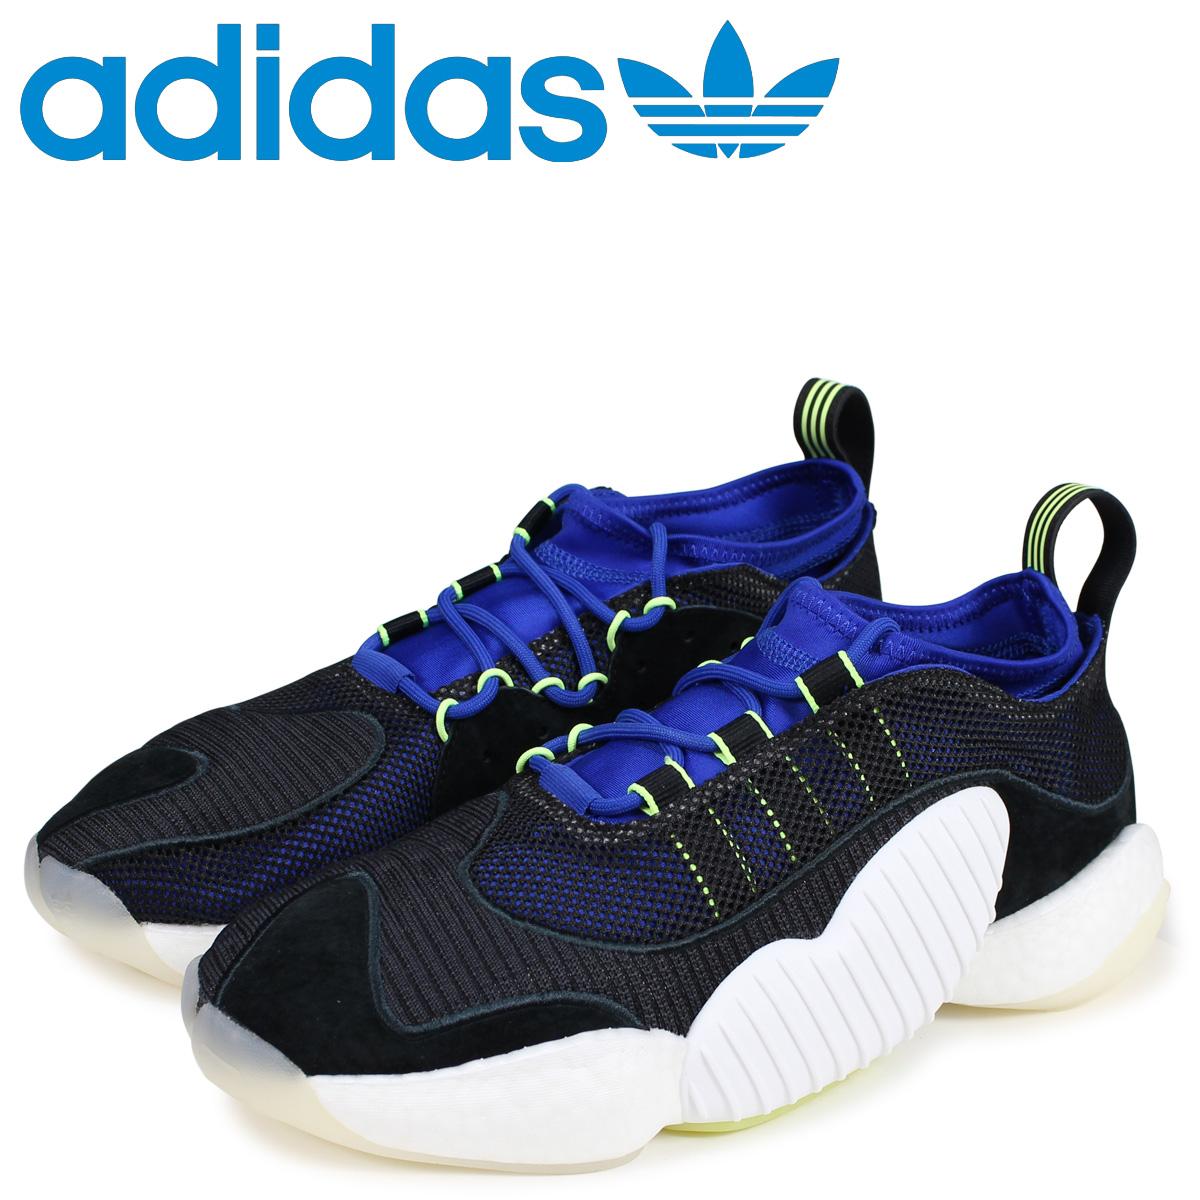 adidas Originals アディダス オリジナルス クレイジー スニーカー メンズ CRAZY BYW LVL II ブラック 黒 BD7998 [4/4 新入荷]